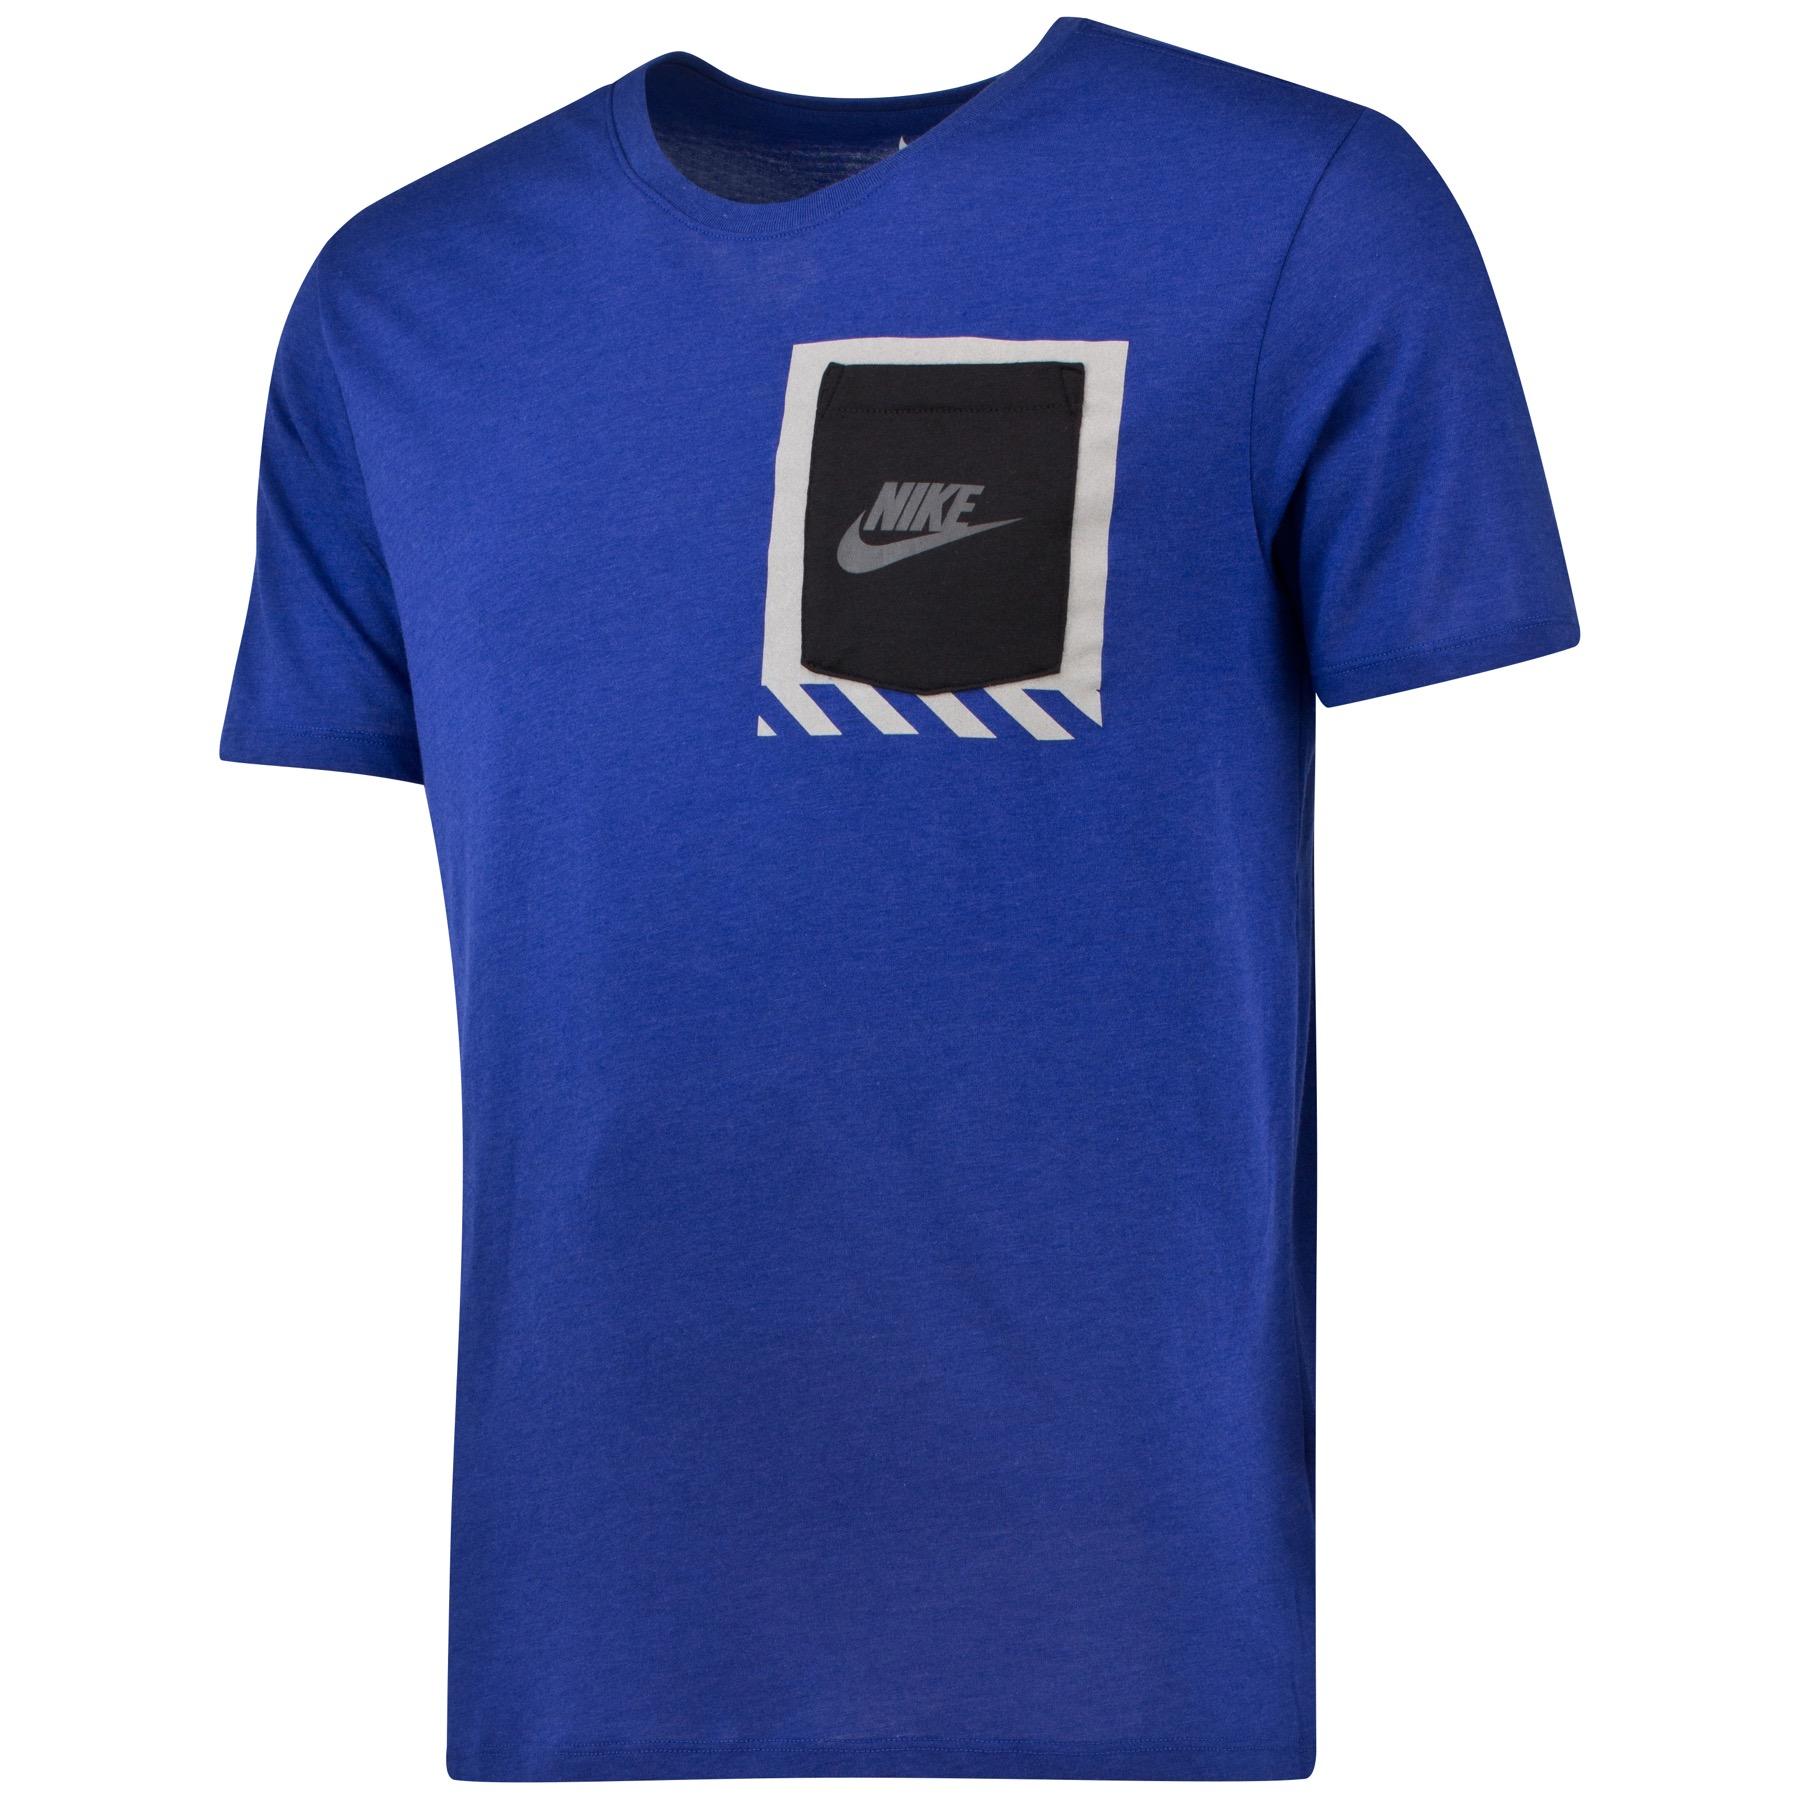 Image of Nike Bonded Box Pocket T-Shirt Royal Blue, Blue